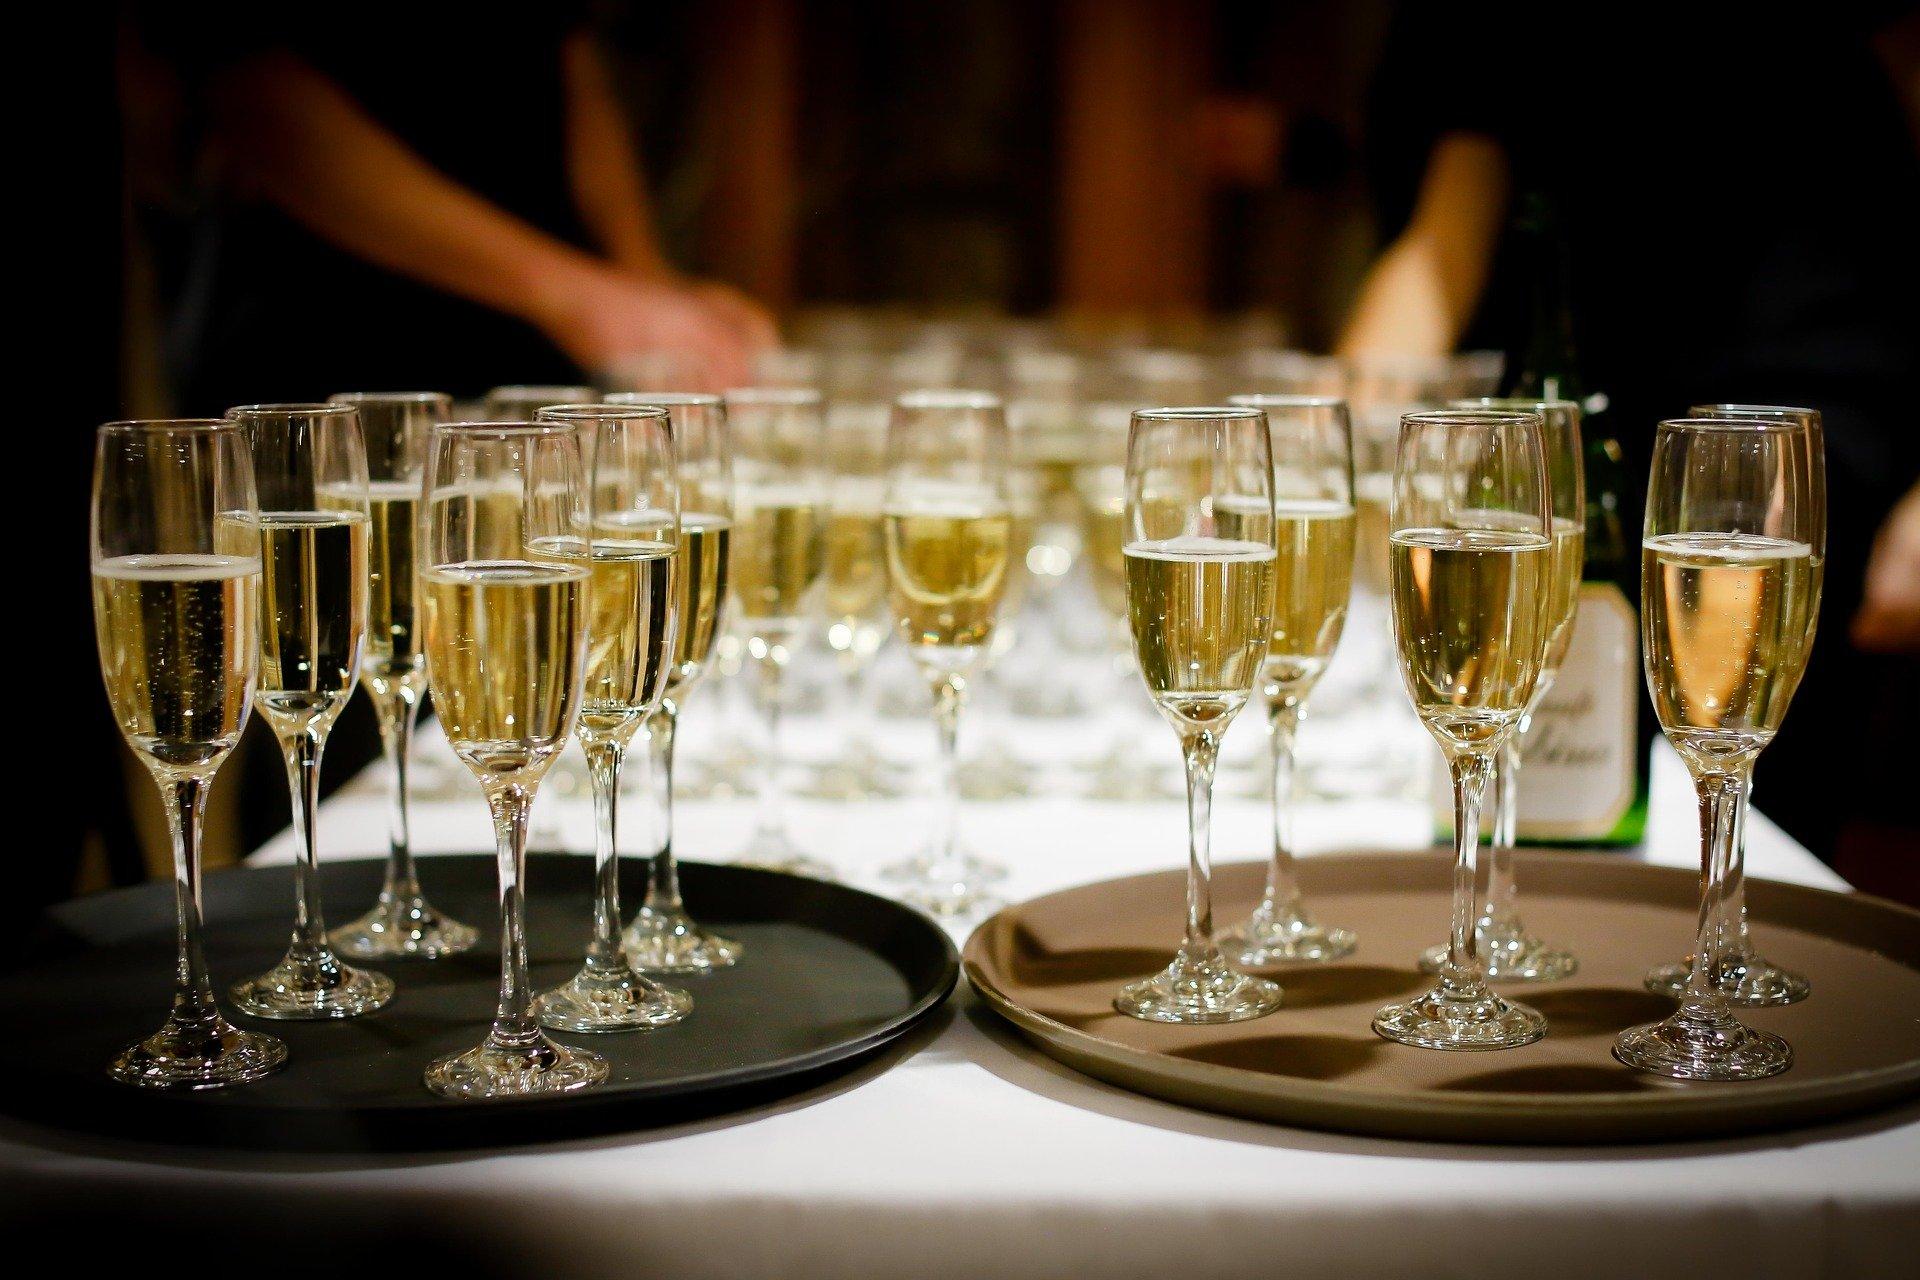 Many glasses of sparkling wine.